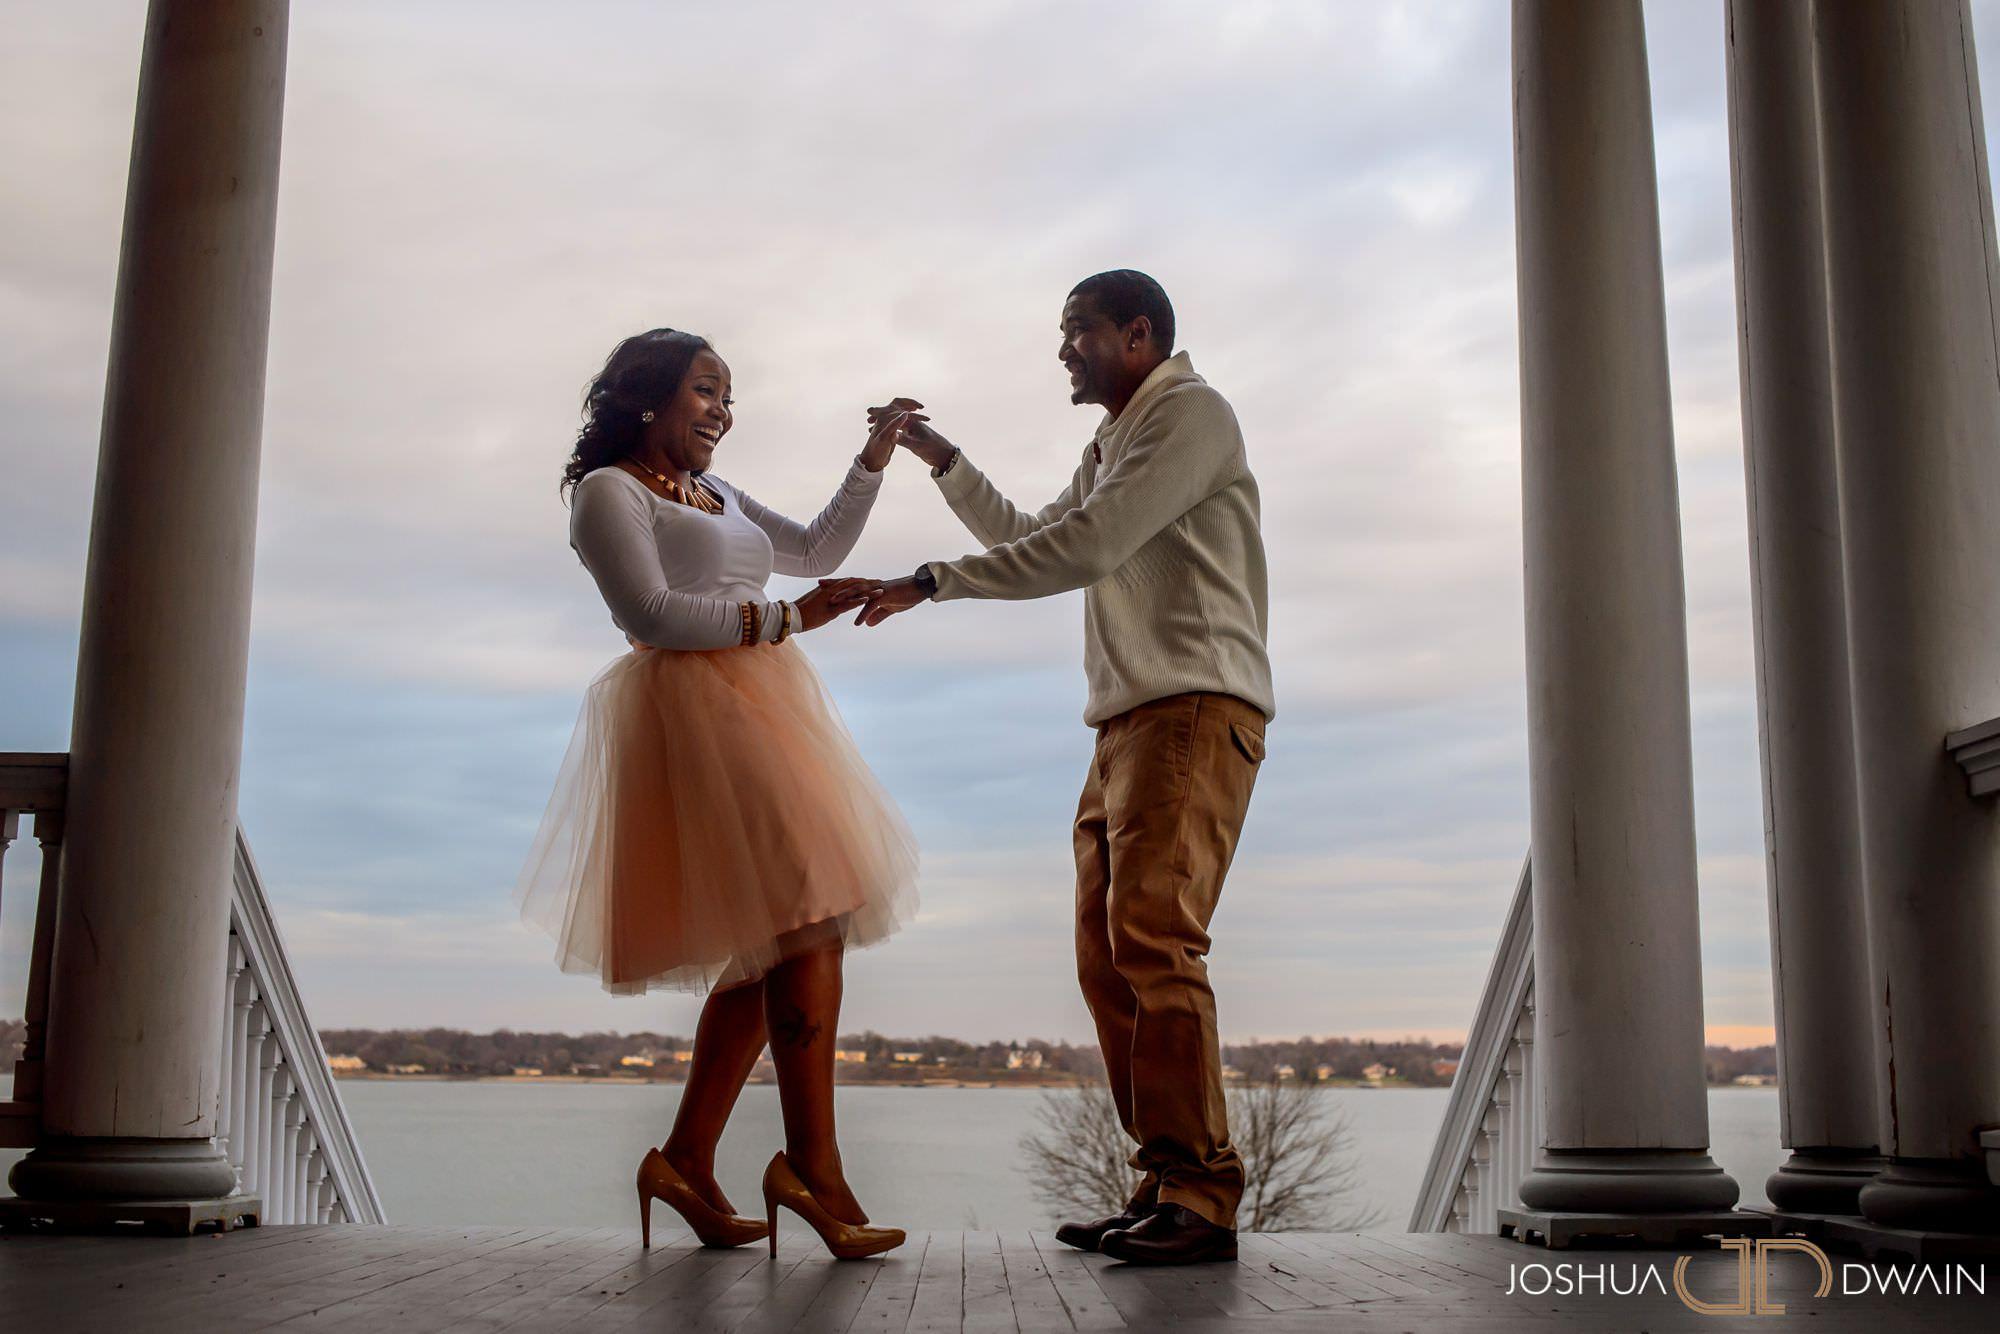 Luan & Joseph's engagement session at Fort Totten Park